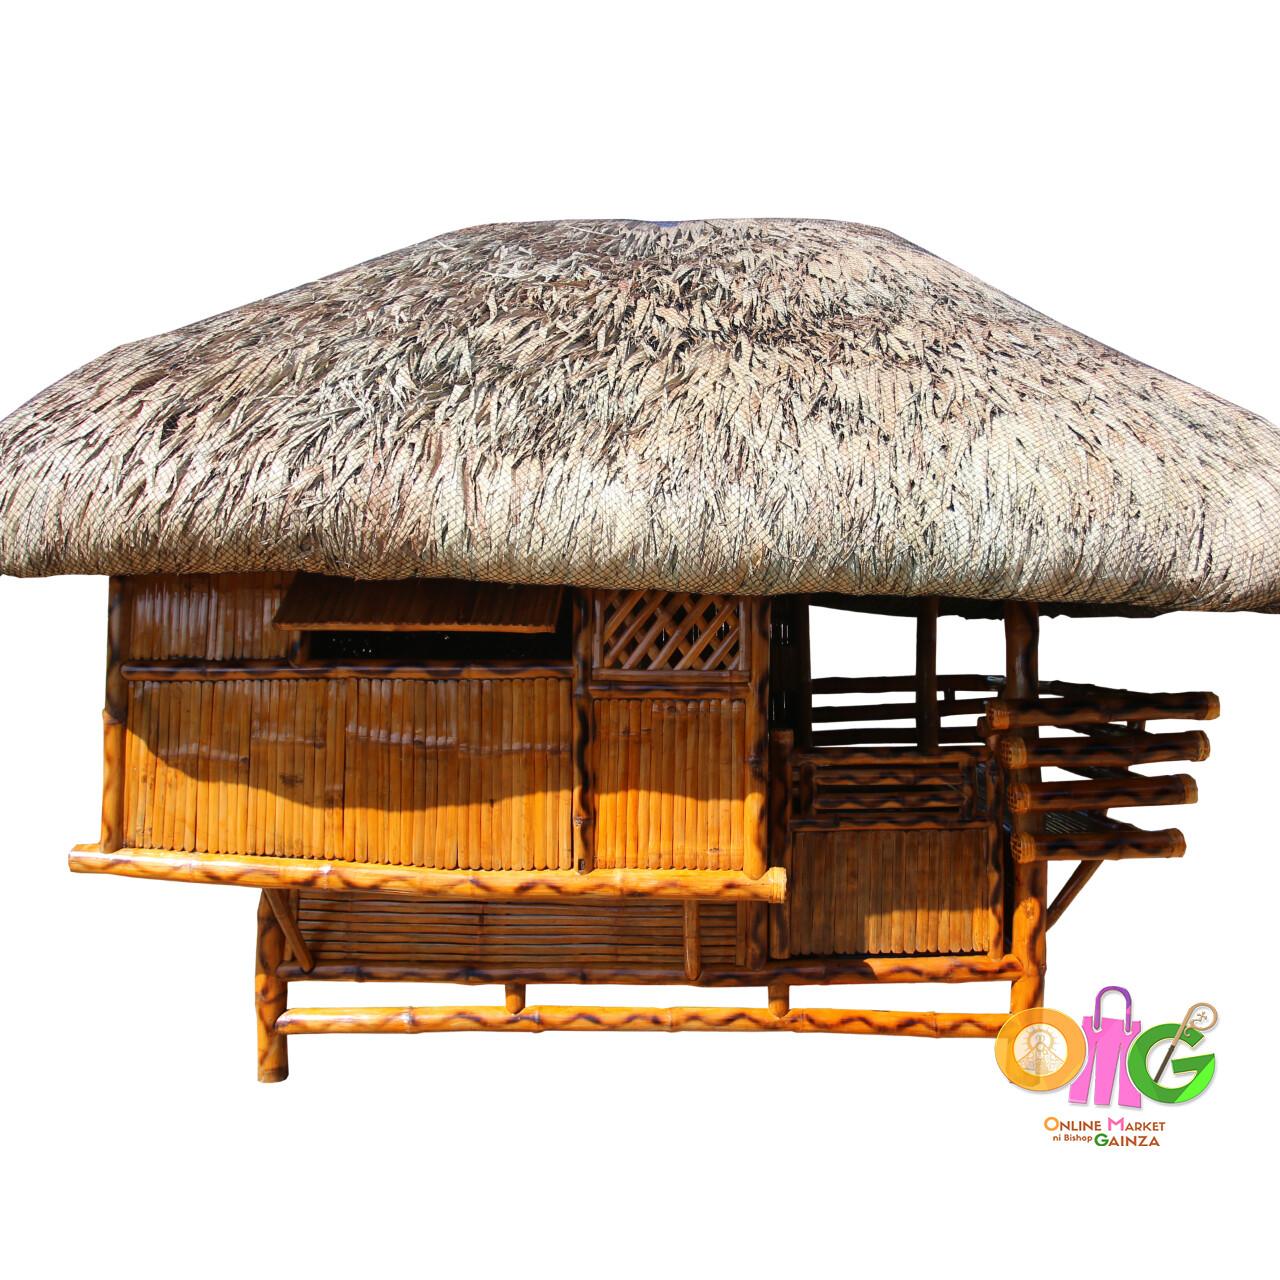 Sir Zaldy Furniture - Bahay Kubo with Room